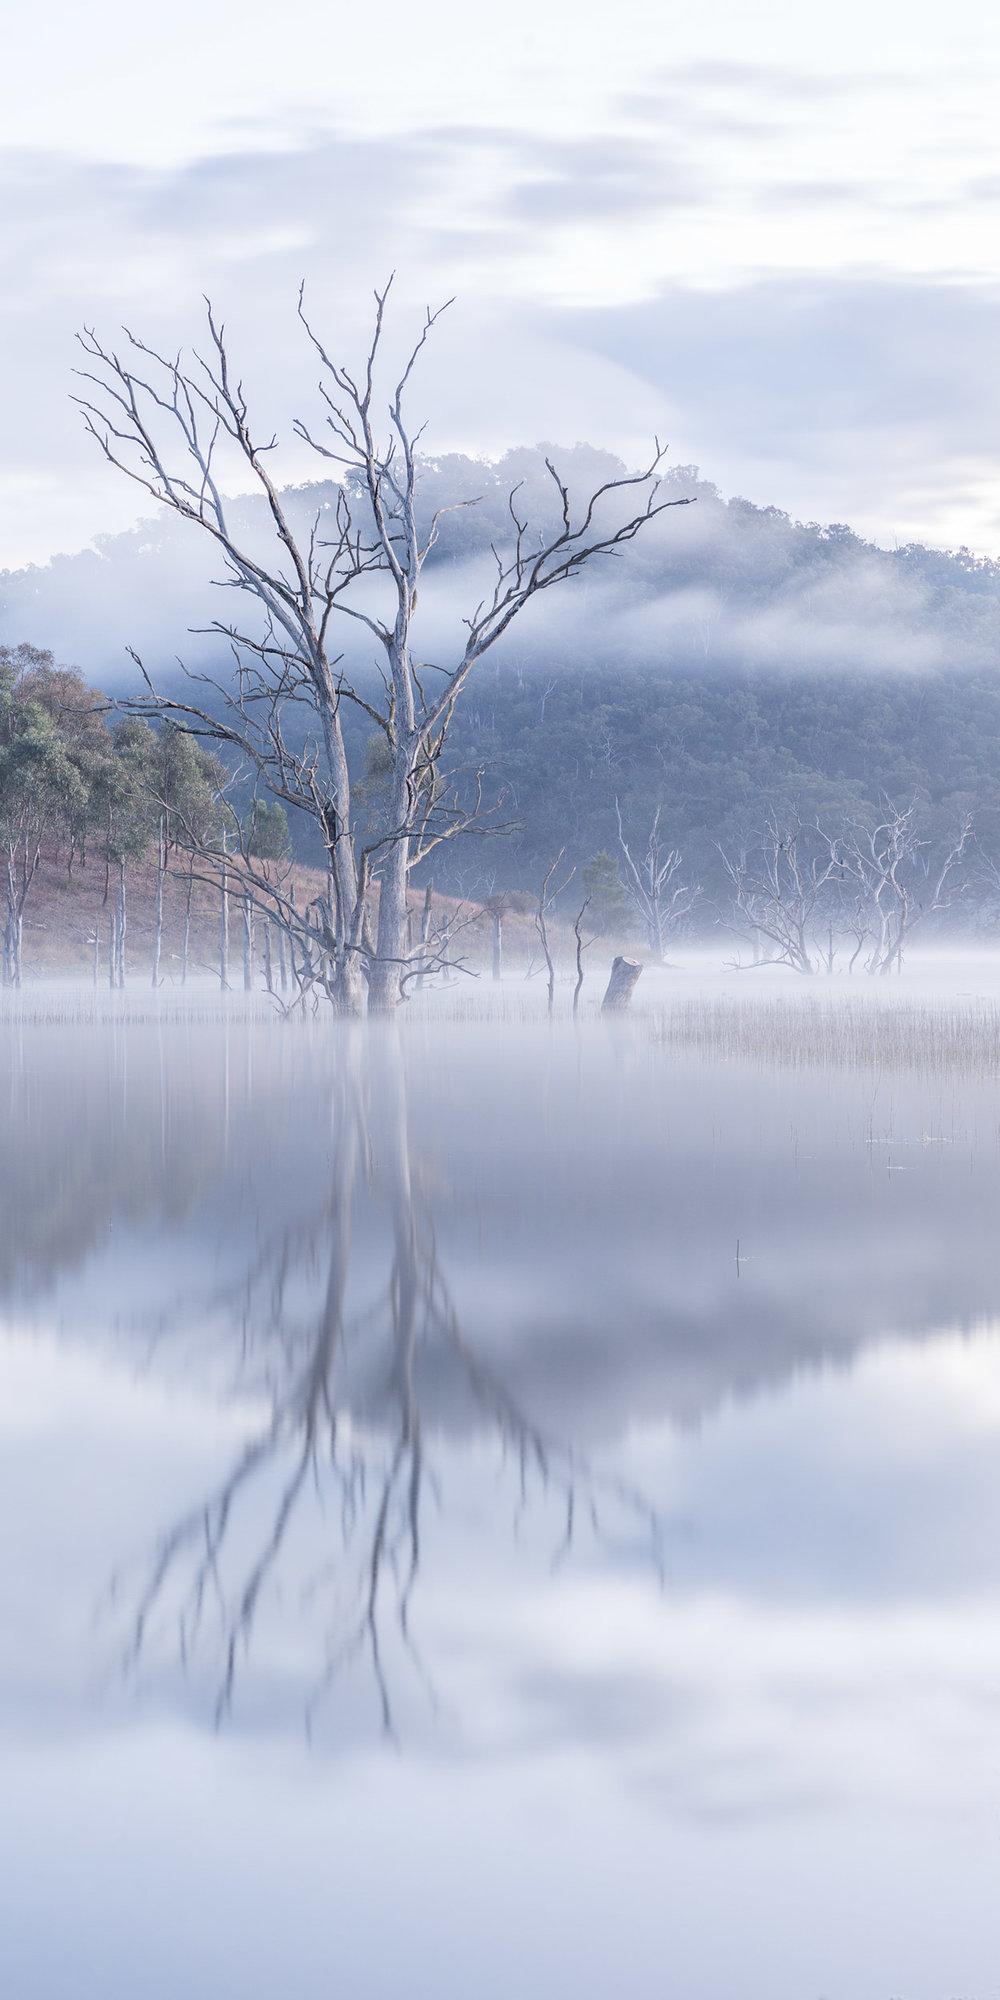 HELEN TRENERRY Photographer - Landscape - Windamere Morning Mist